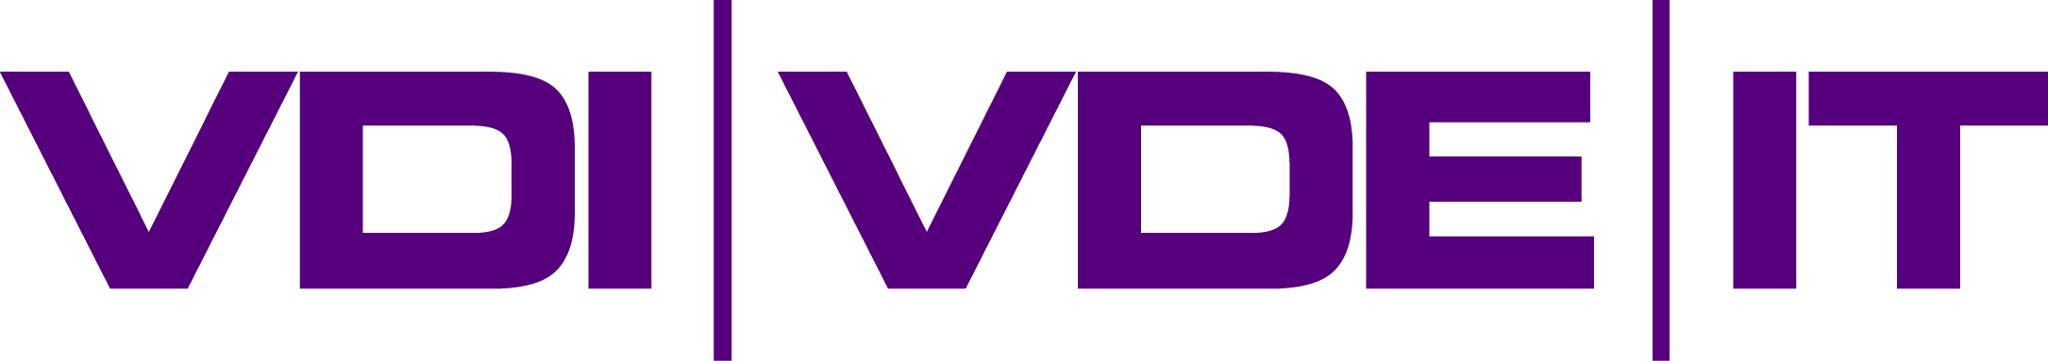 vdi_vde_it_logo_rgb.png